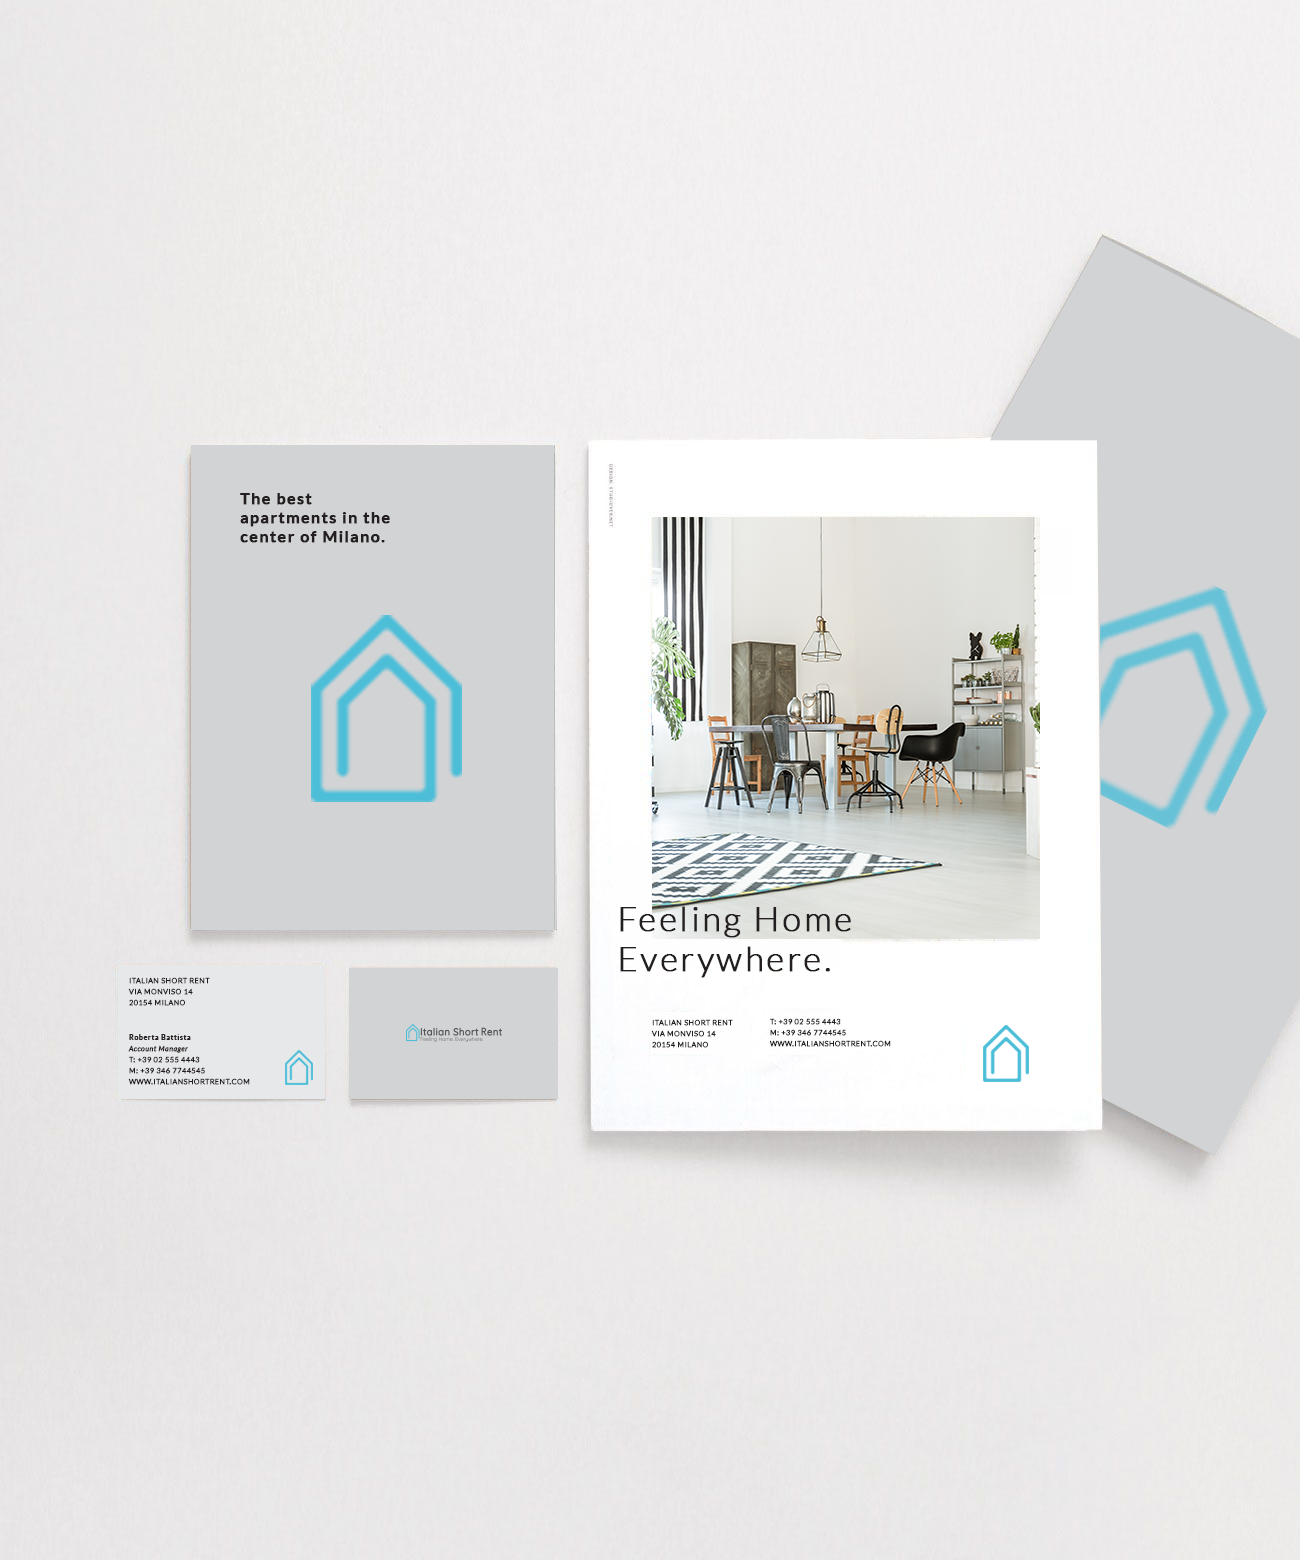 brand_identiti_italian_short_rent_defuse_design_01